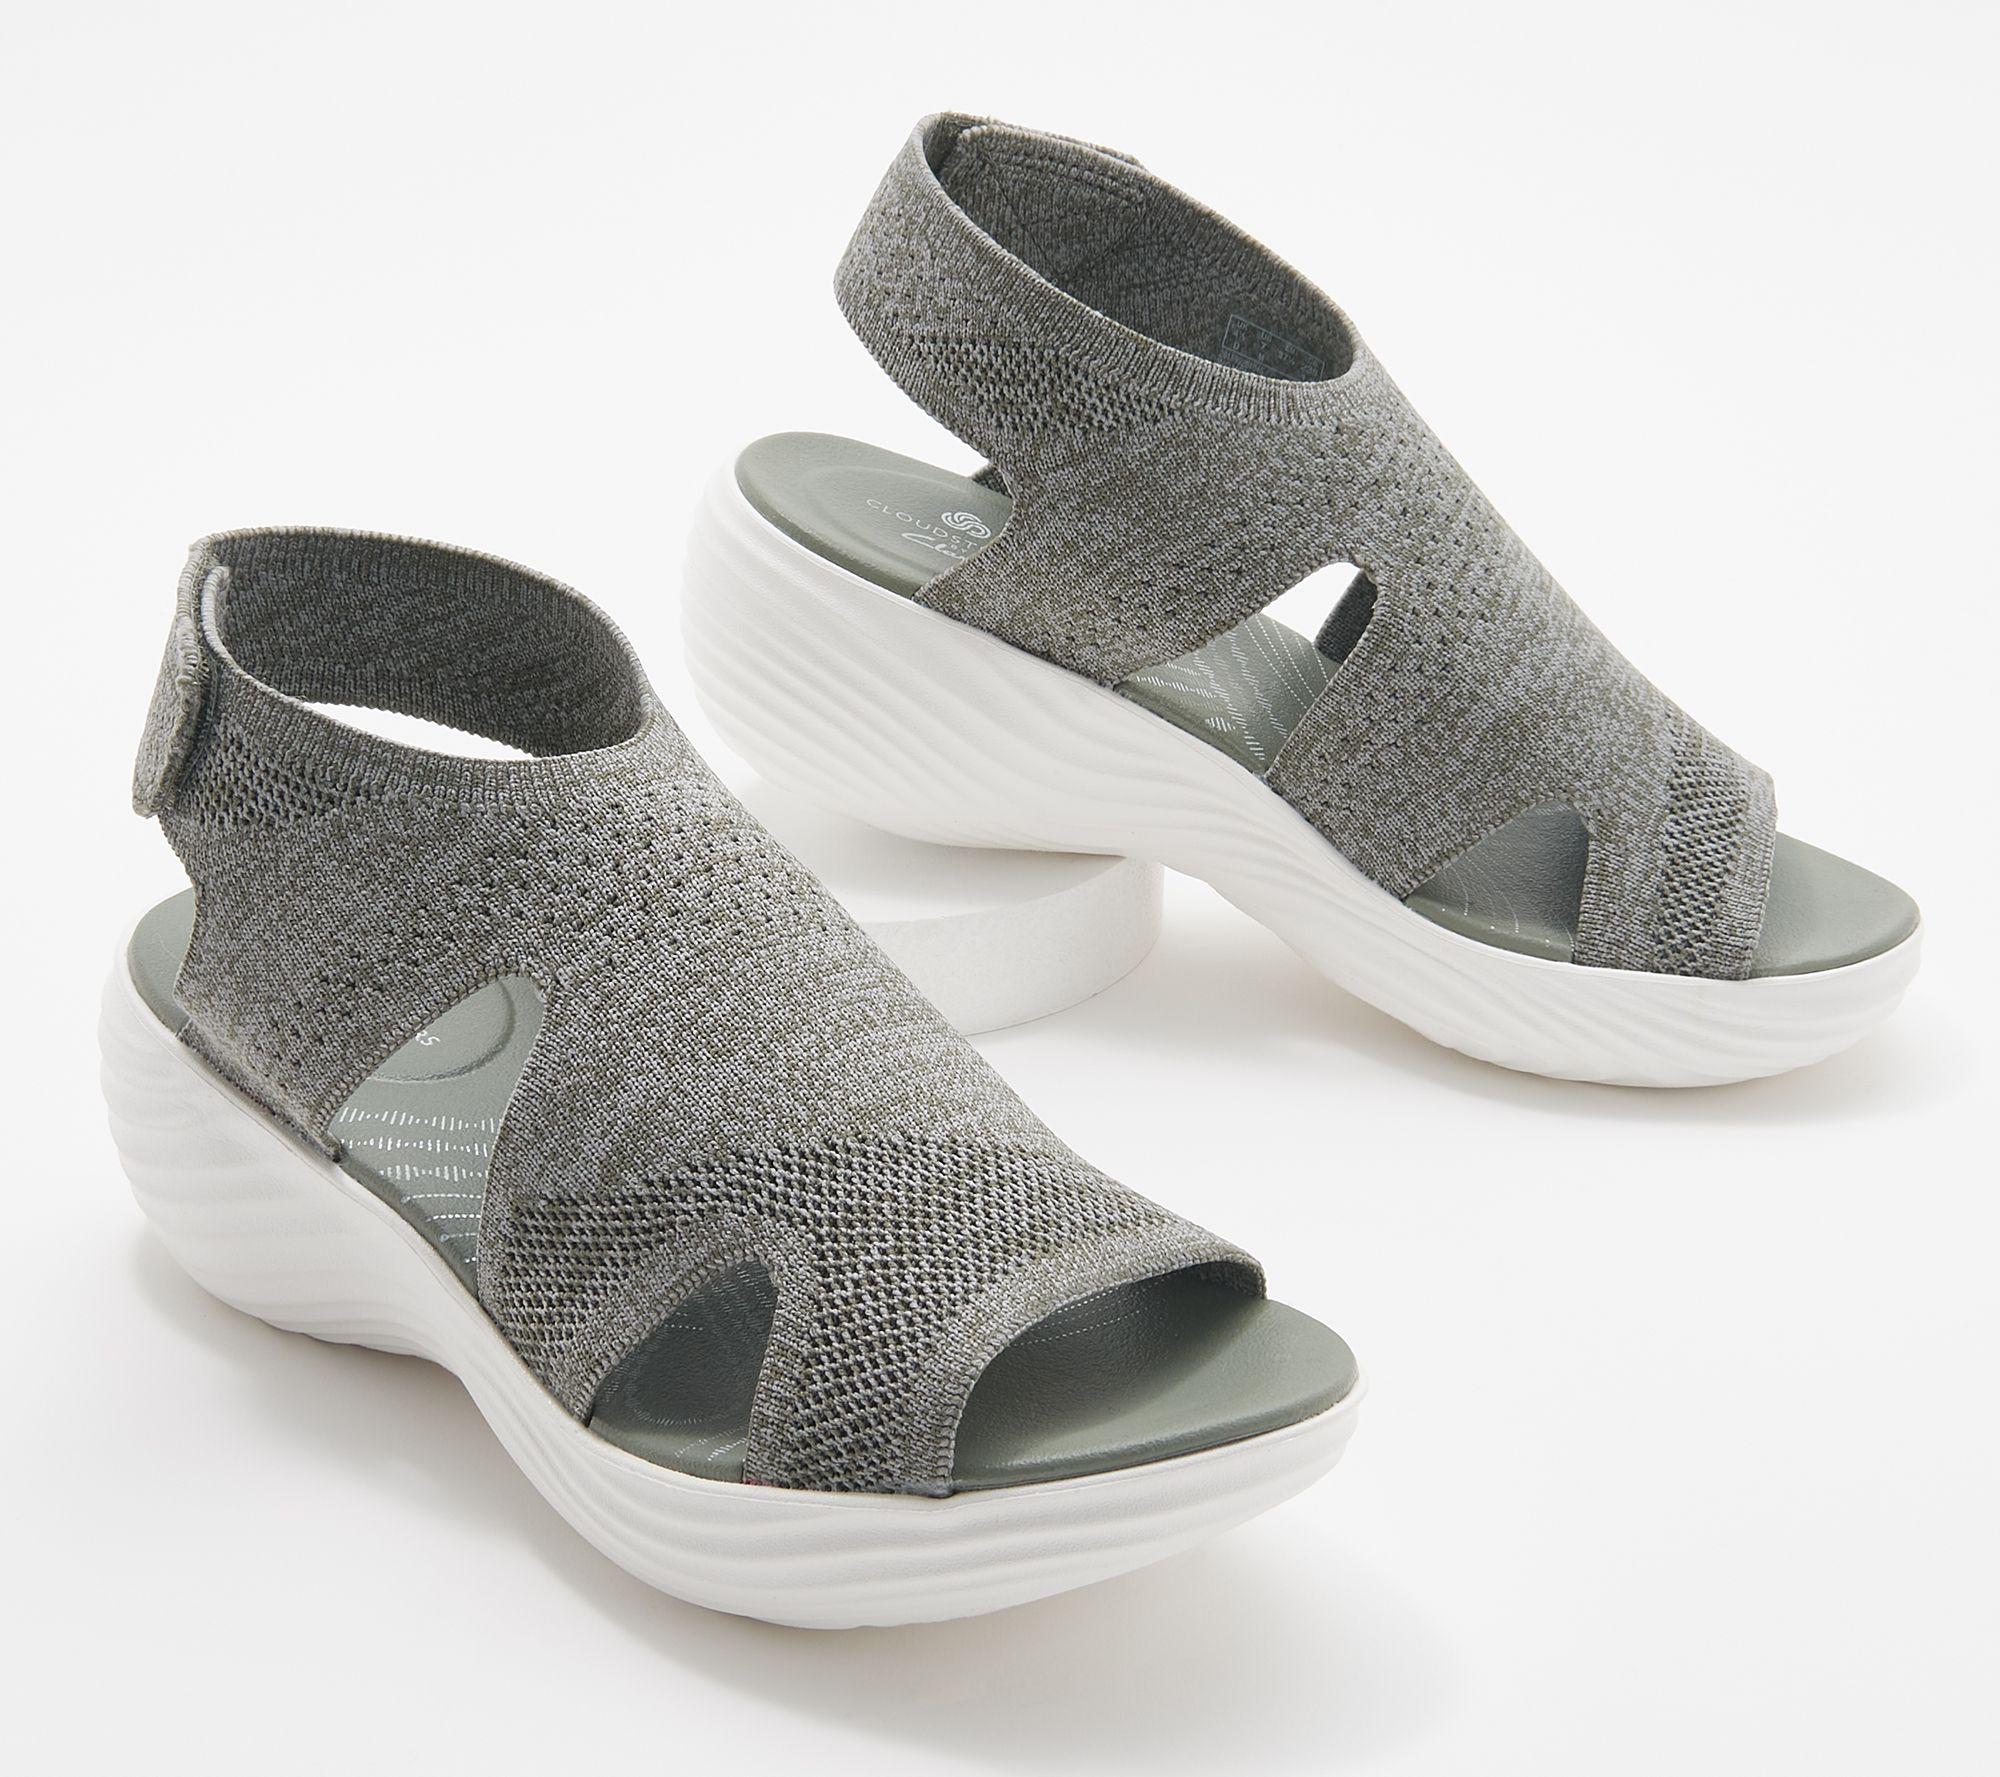 Details about  /Clarks Cloud Stepper Women/'s US 8 M Comfort Casual Slide Sandal Navy Or Brown